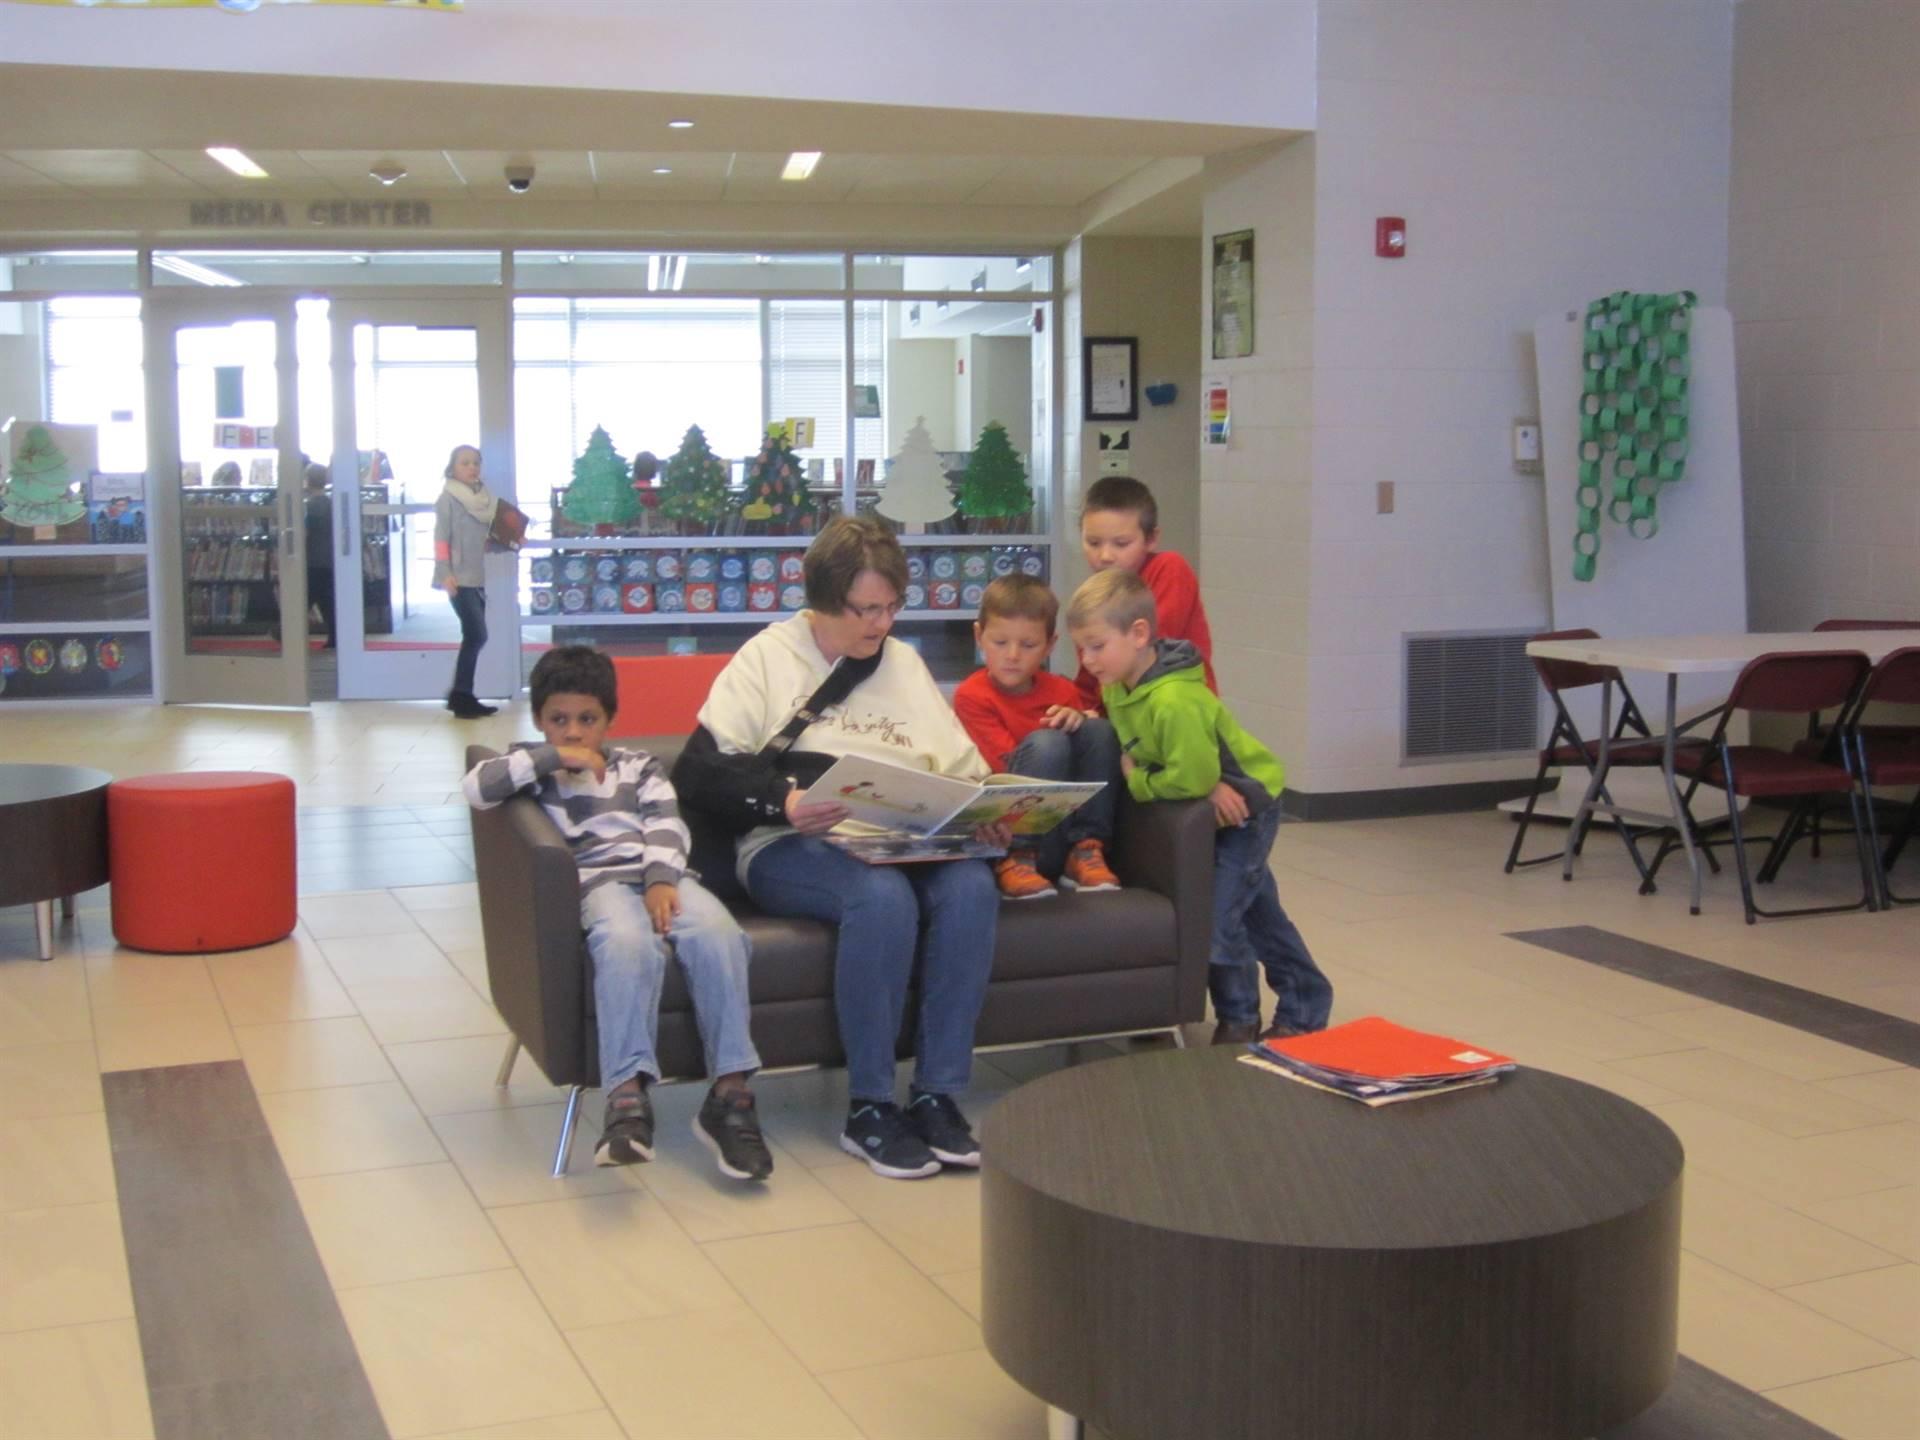 A volunteer reading with 4 kindergarteners